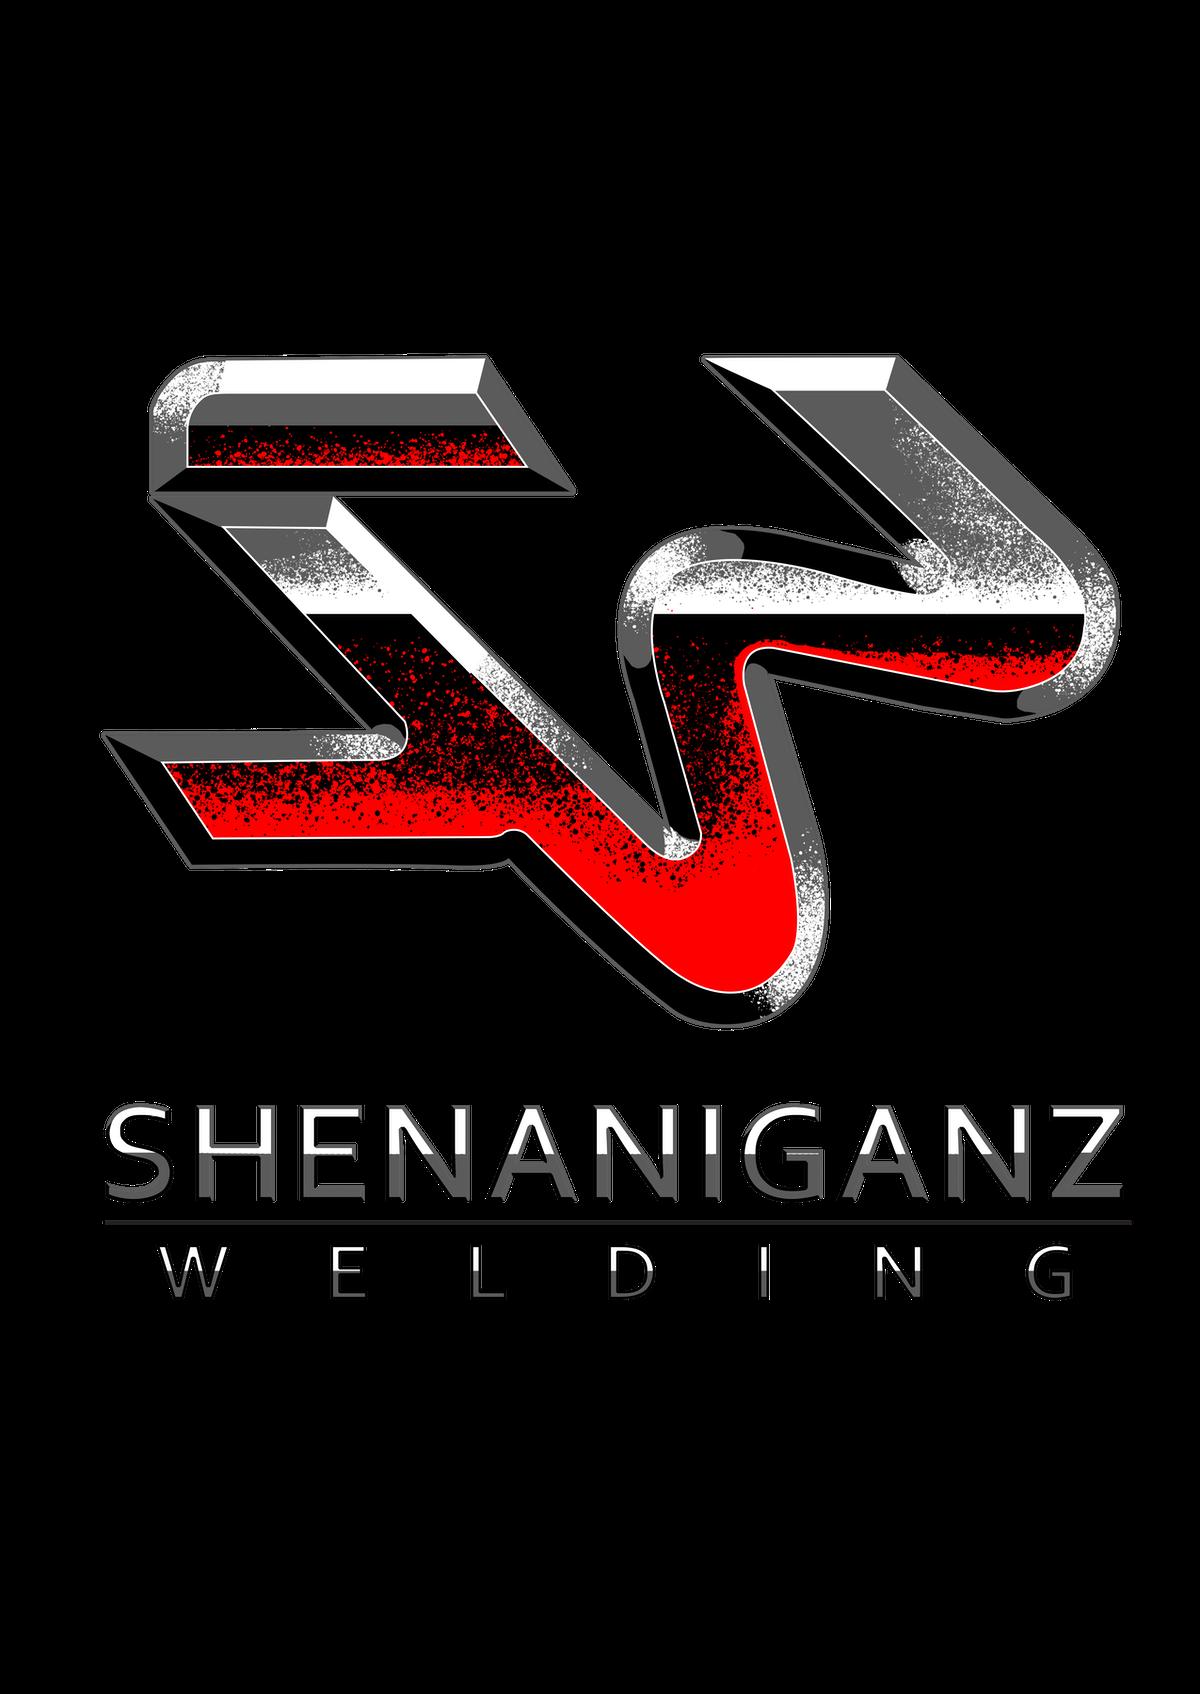 Shenaniganz Welding logo